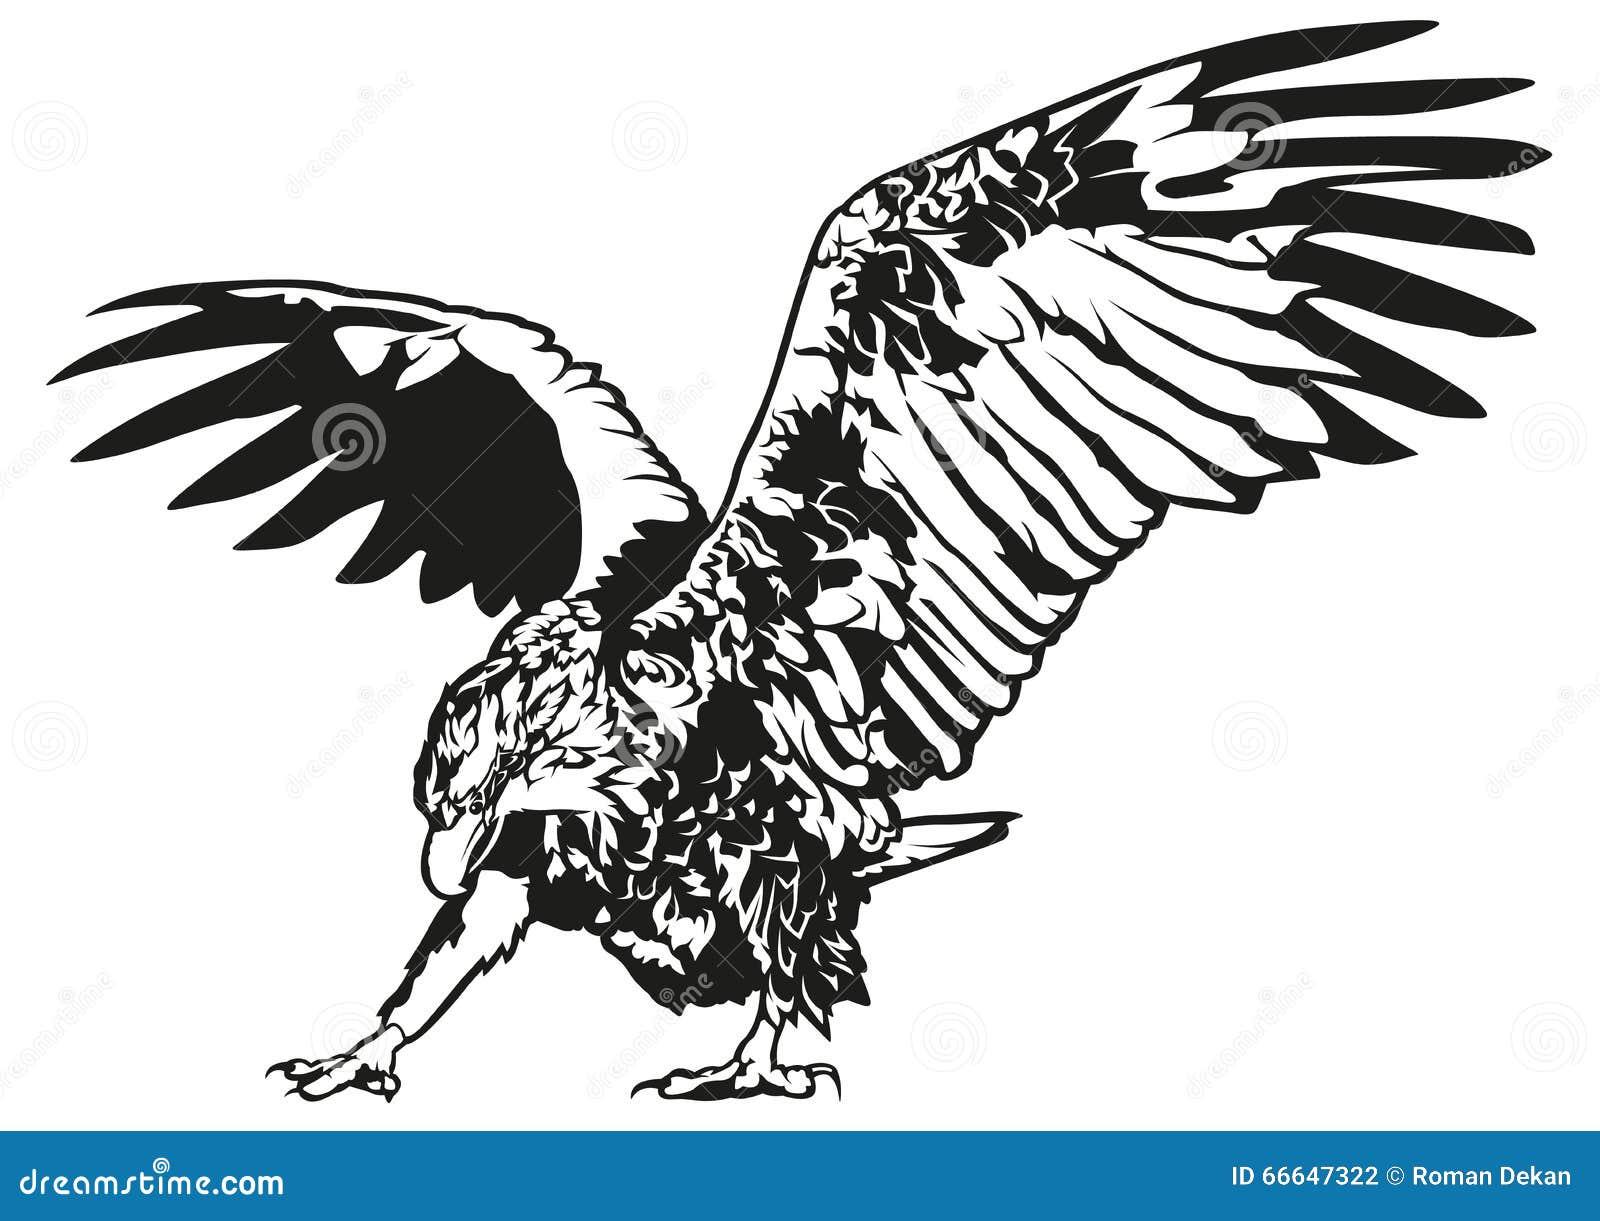 Black and White Eagle stock vector. Image of flying, beak ...